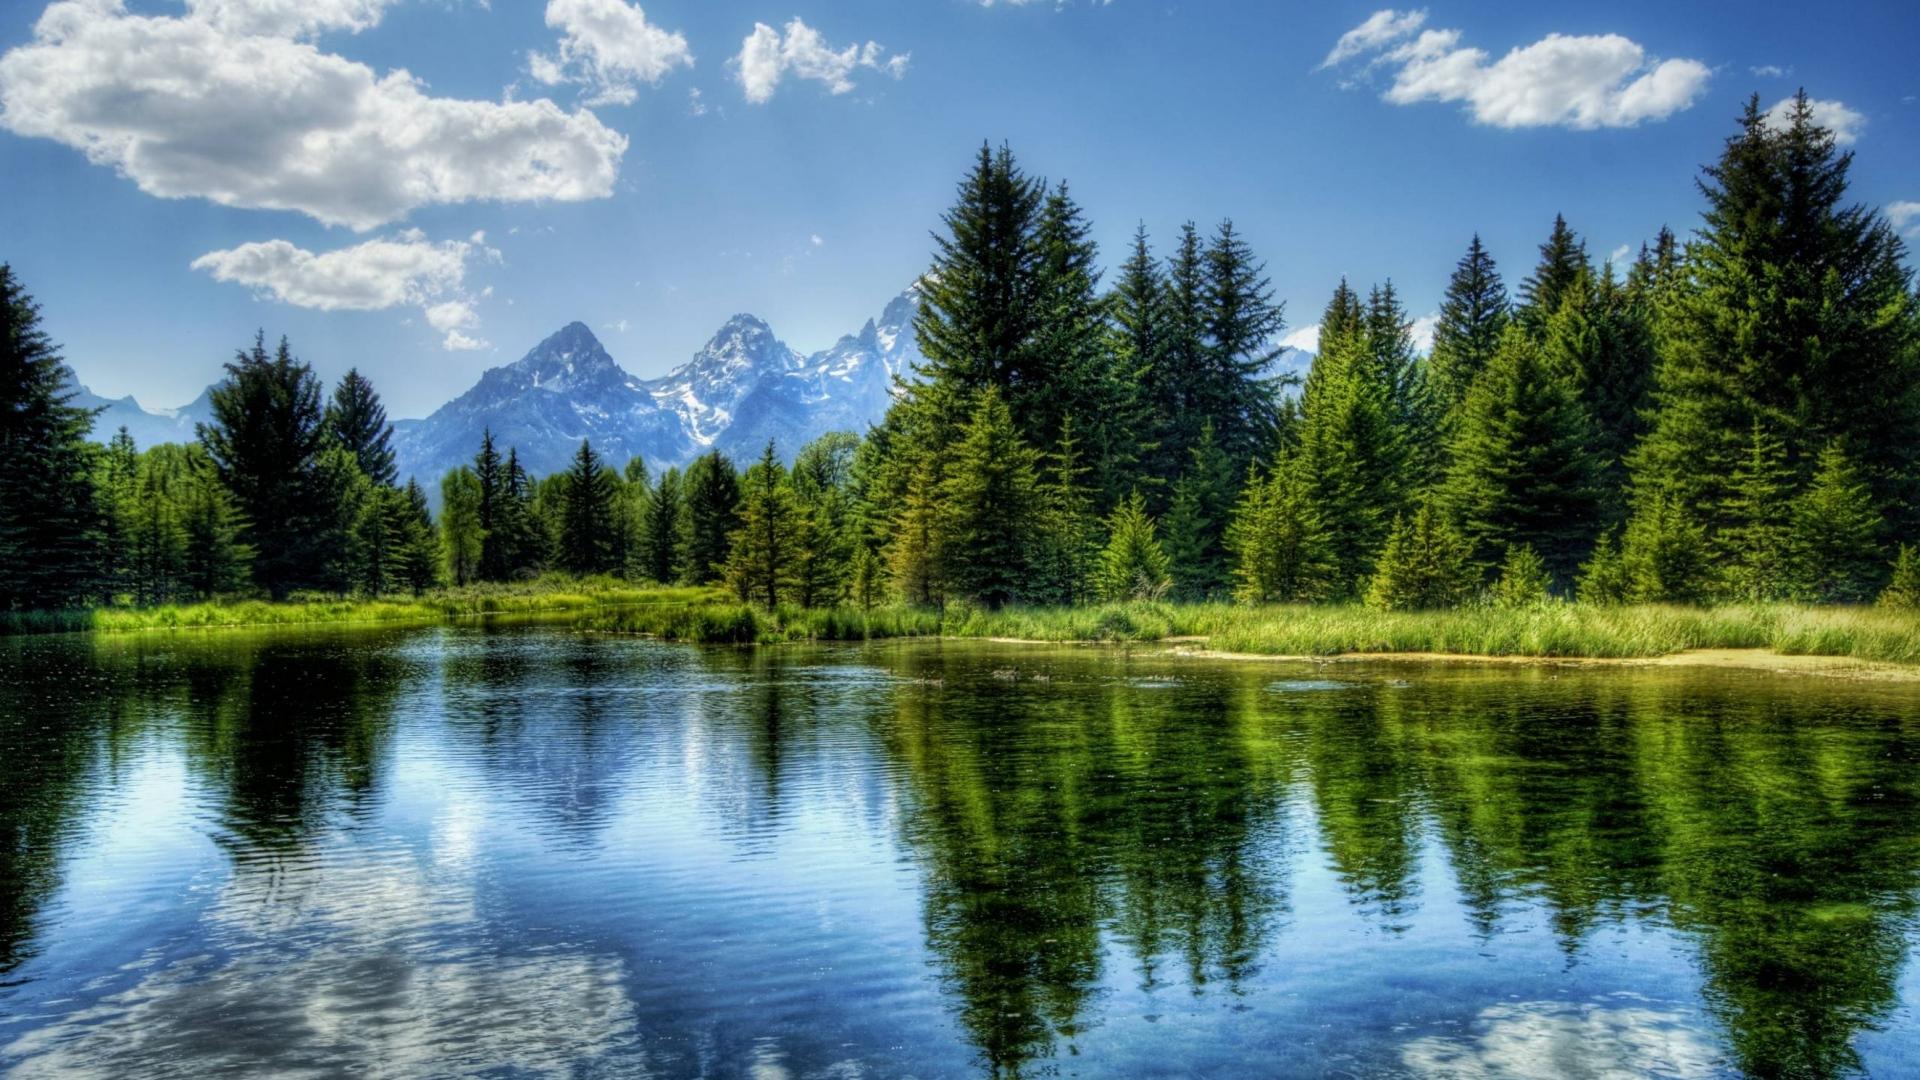 Wonderful landscape hd wallpapers 1080p For Desktop Backgrounds